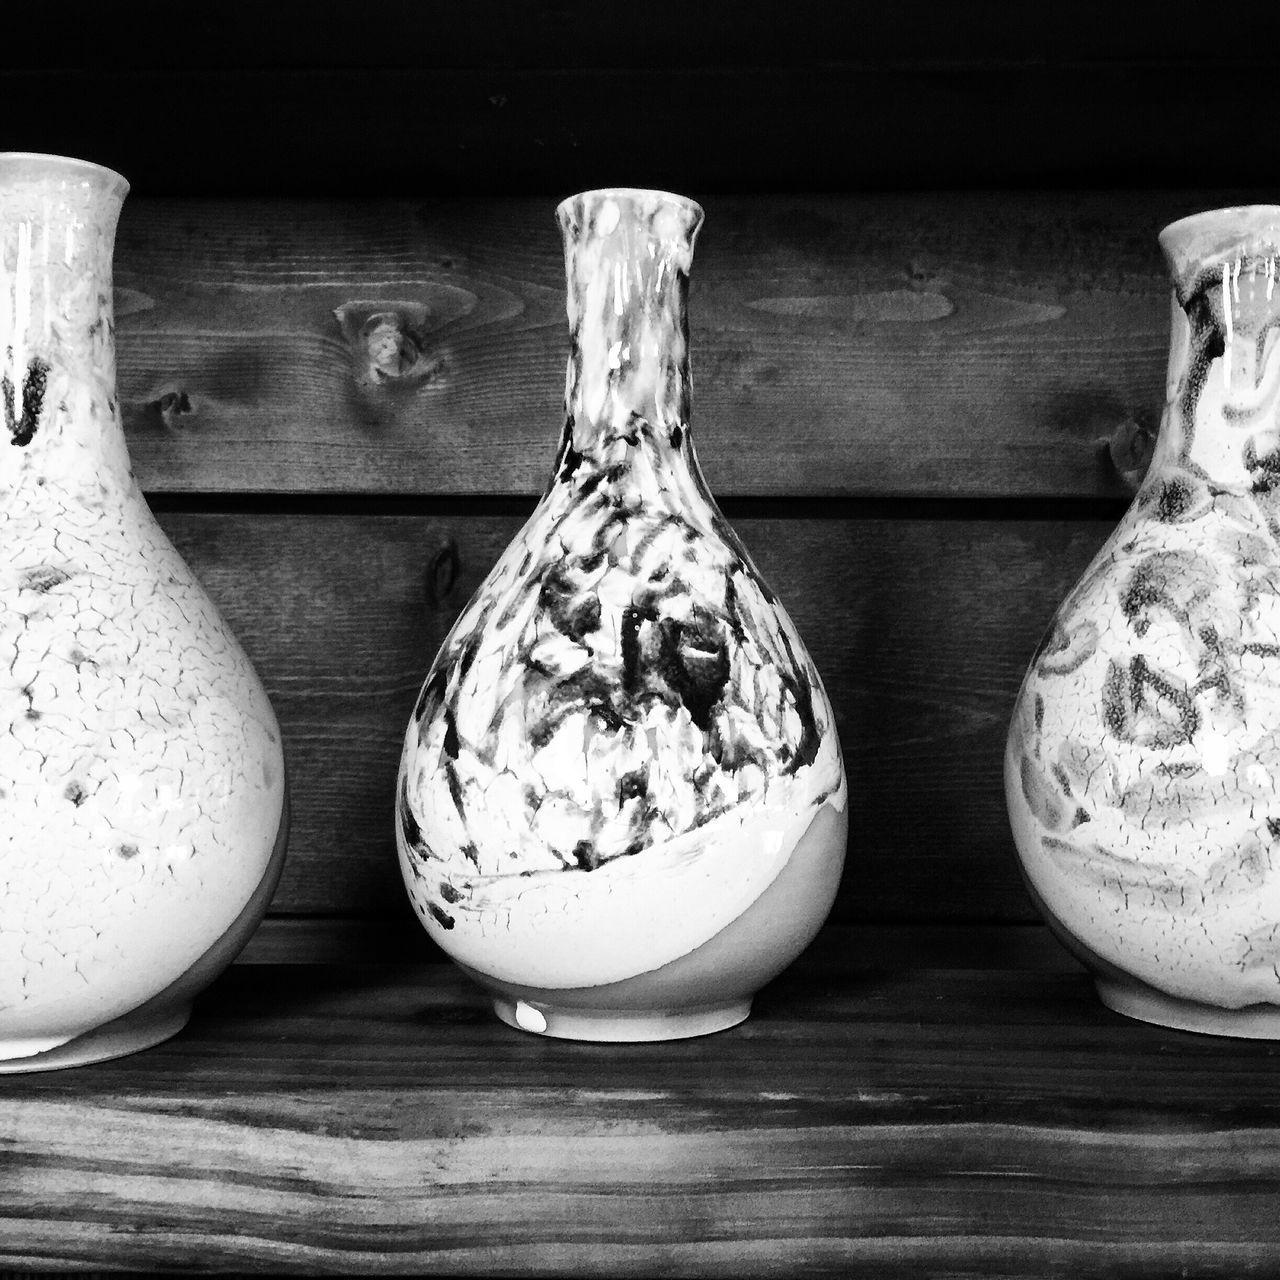 Pottery Pottery Art Ceramic Jars  Tea Time Blackandwhite Monochrome EyeemKorea